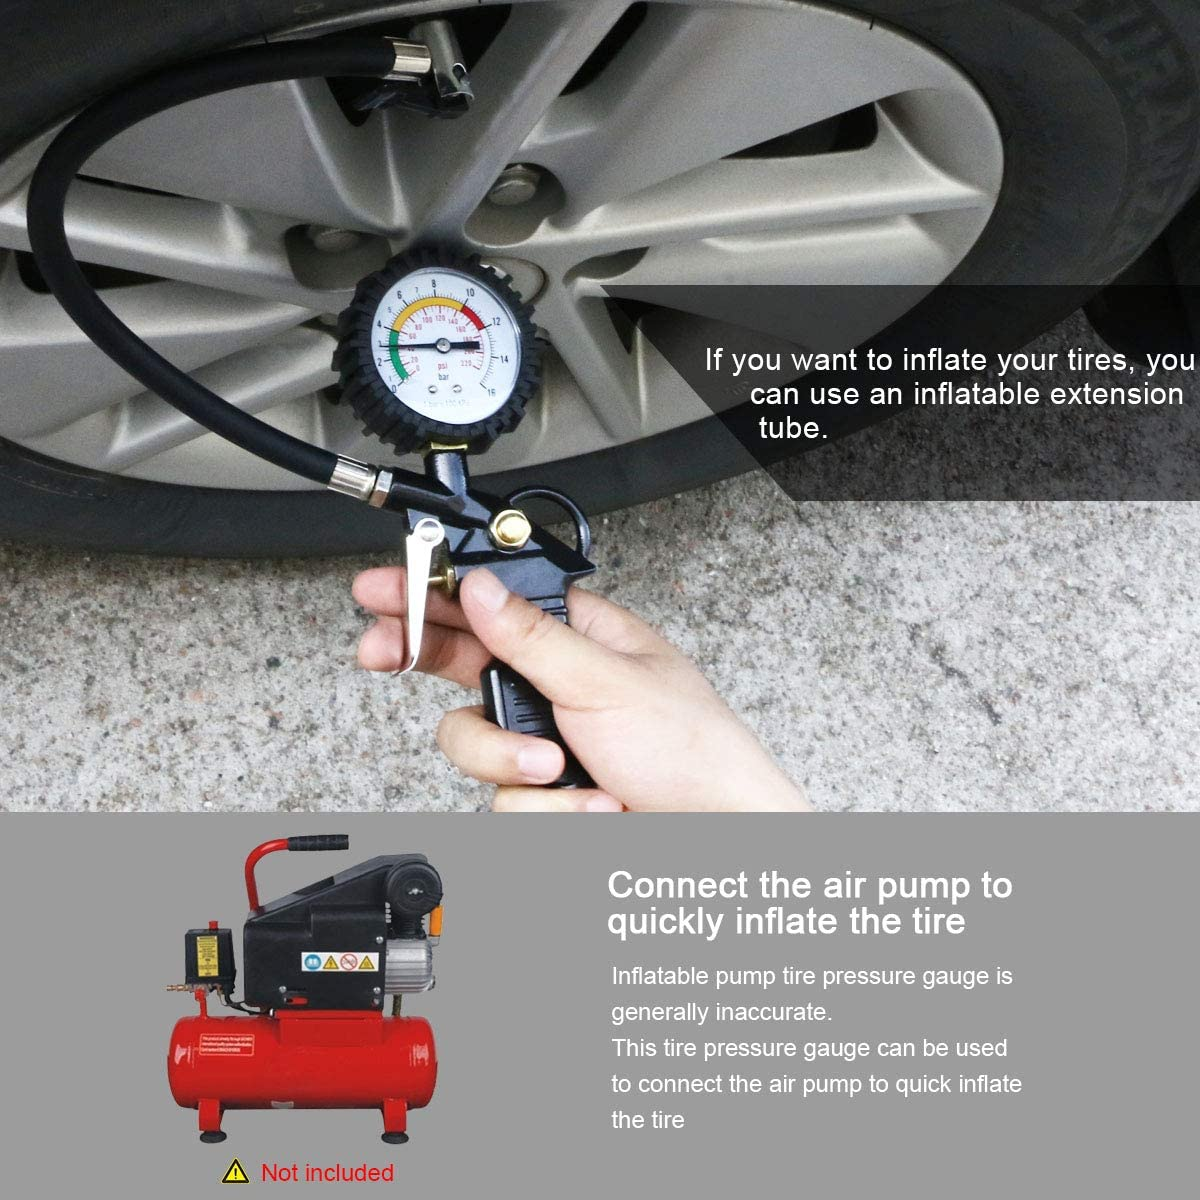 Uraqt Air Pressure Gauge Tyre Inflator Tyre Pressure Gauge 220 Psi Tyre Inflator Gauge Multifunction Air Pressure Gauge With Valve Core Tool Compressor Accessories Black 3 Black Auto